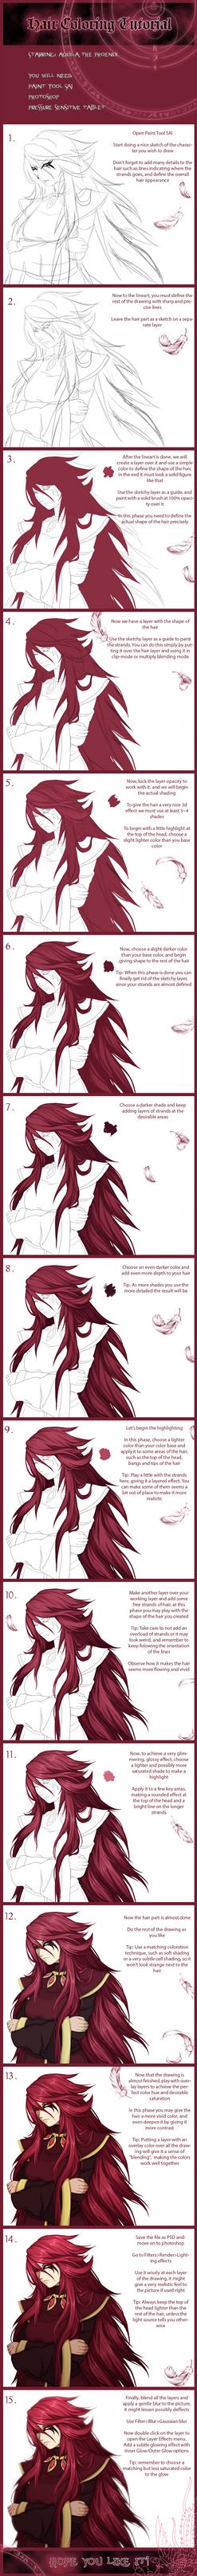 Hair coloring Tutorial by FireEagleSpirit